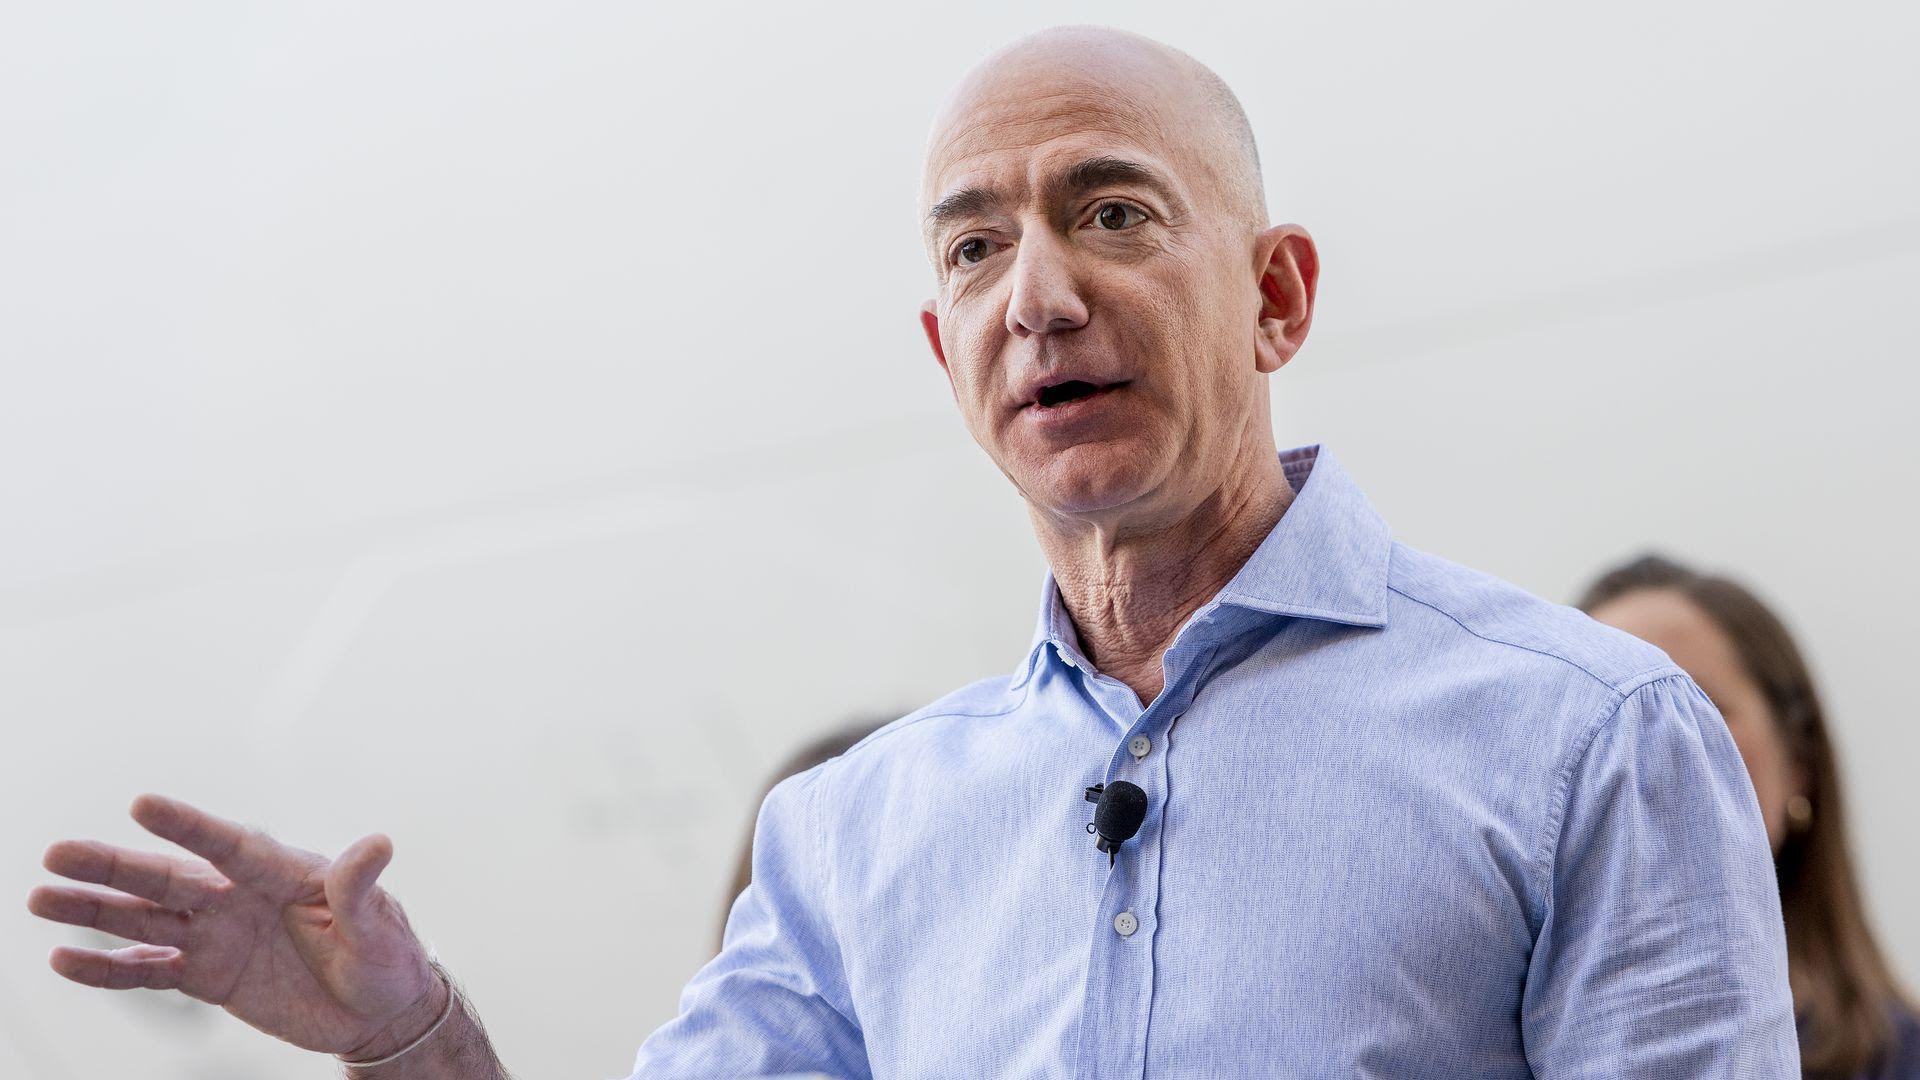 Report: Bezos eyeing NFL team